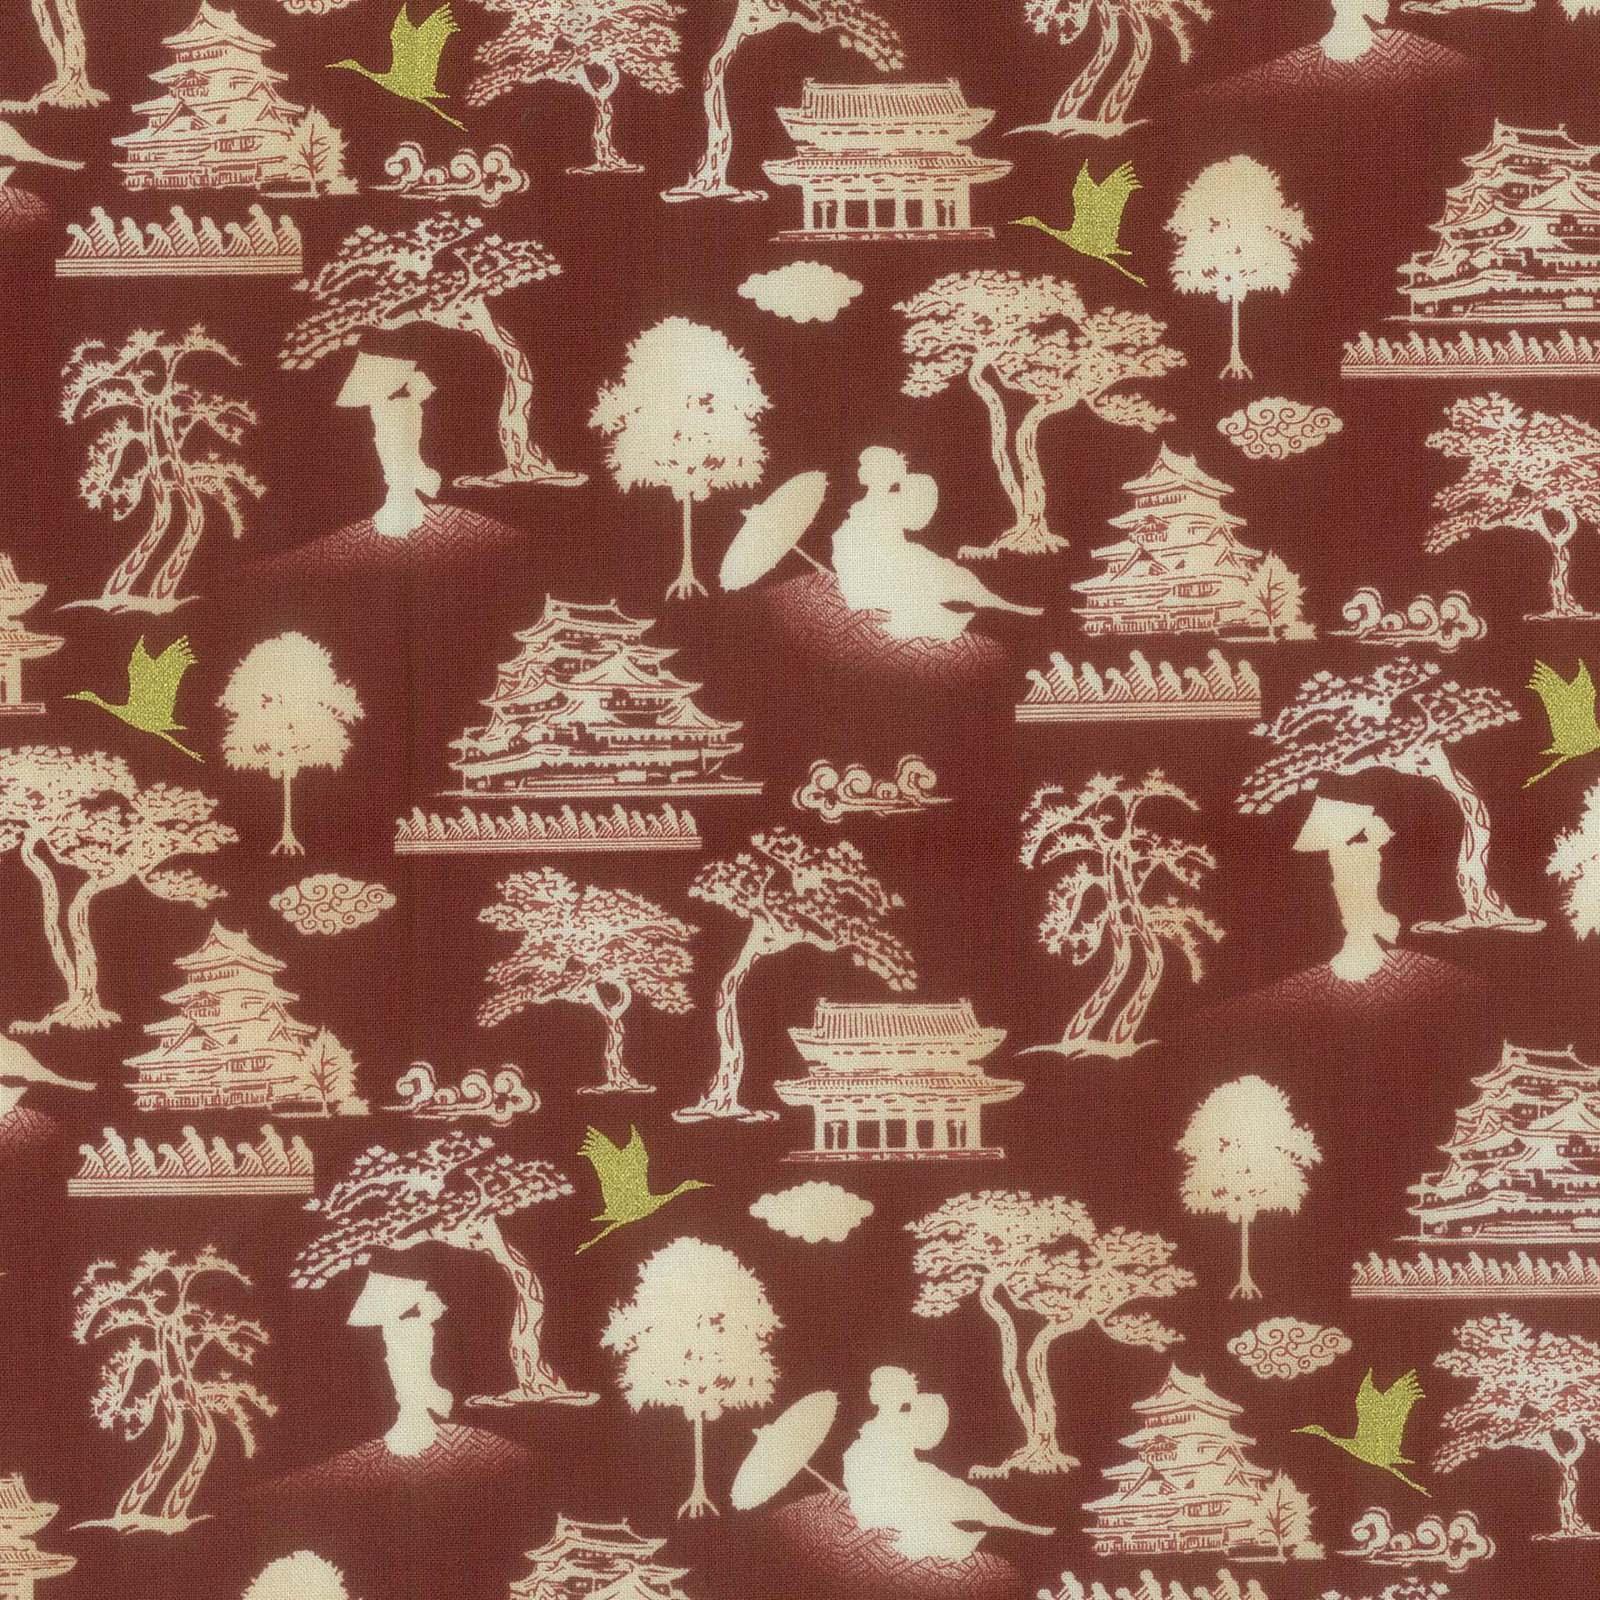 Legacy Studio Quilt Fabric-Scenic   JOANN : quilted fabric joann - Adamdwight.com